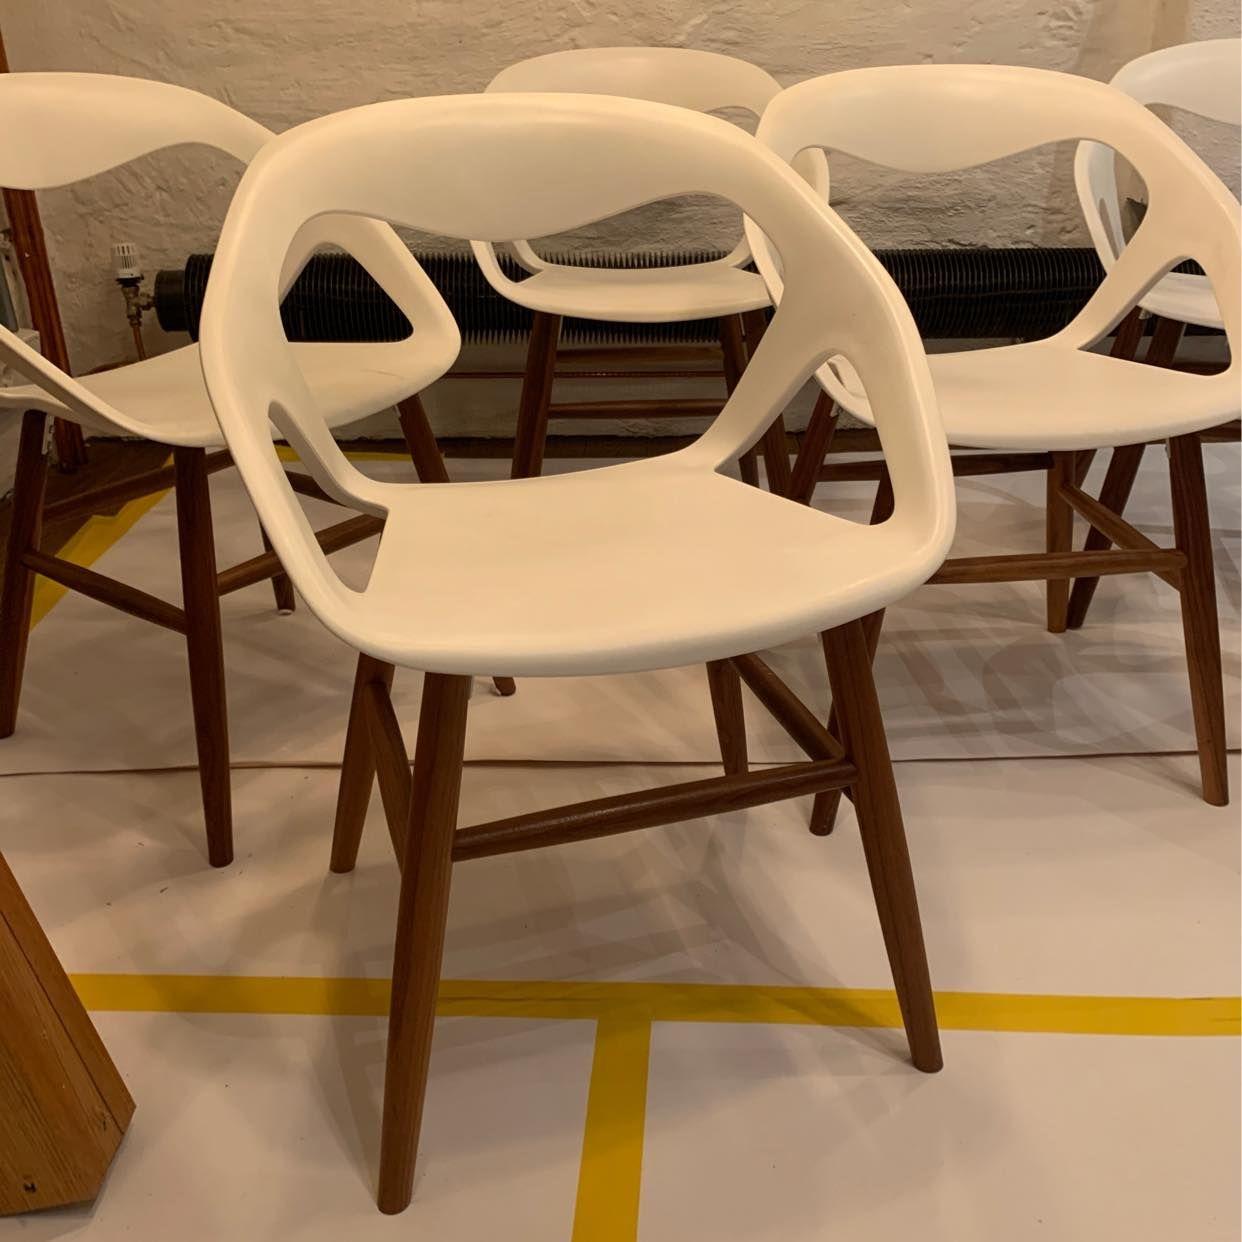 image of 6 vita stolar bortskänkes - Stockholm